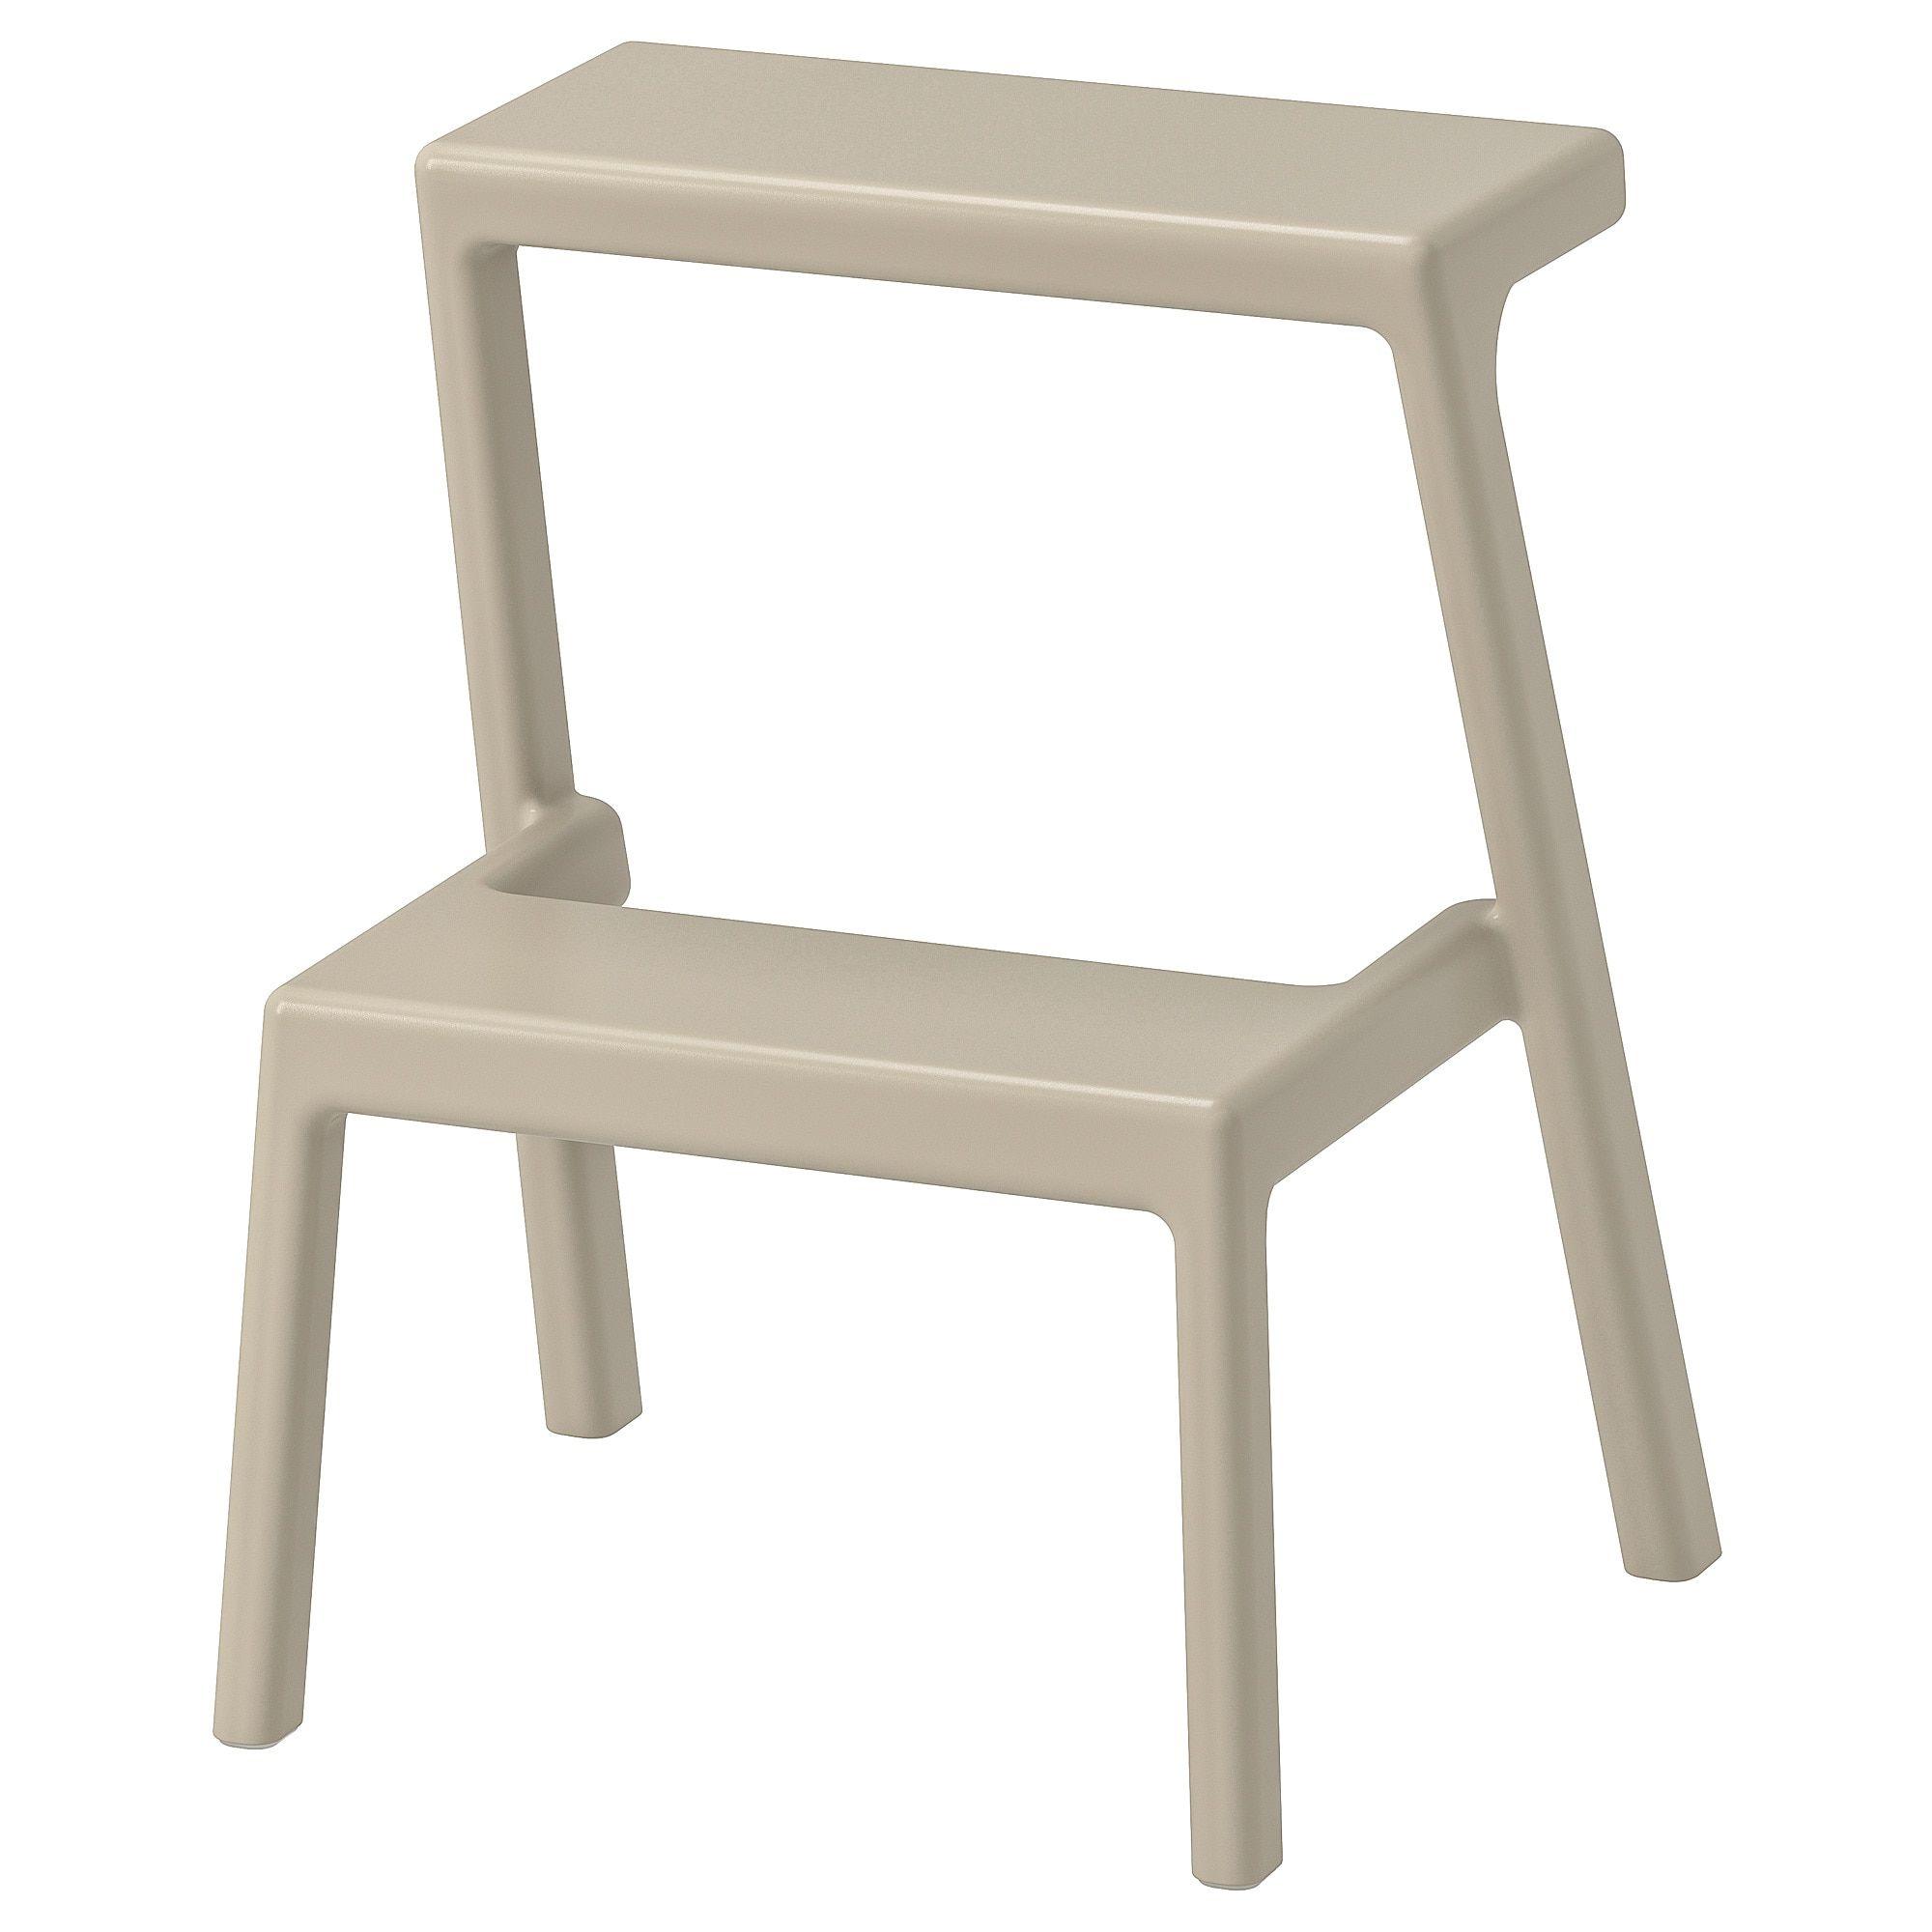 Bekvam Ikea Wooden Step Stool Sturdy Wood Ladders Home Etsy Ikea Step Stool Wooden Step Stool Ikea Bekvam